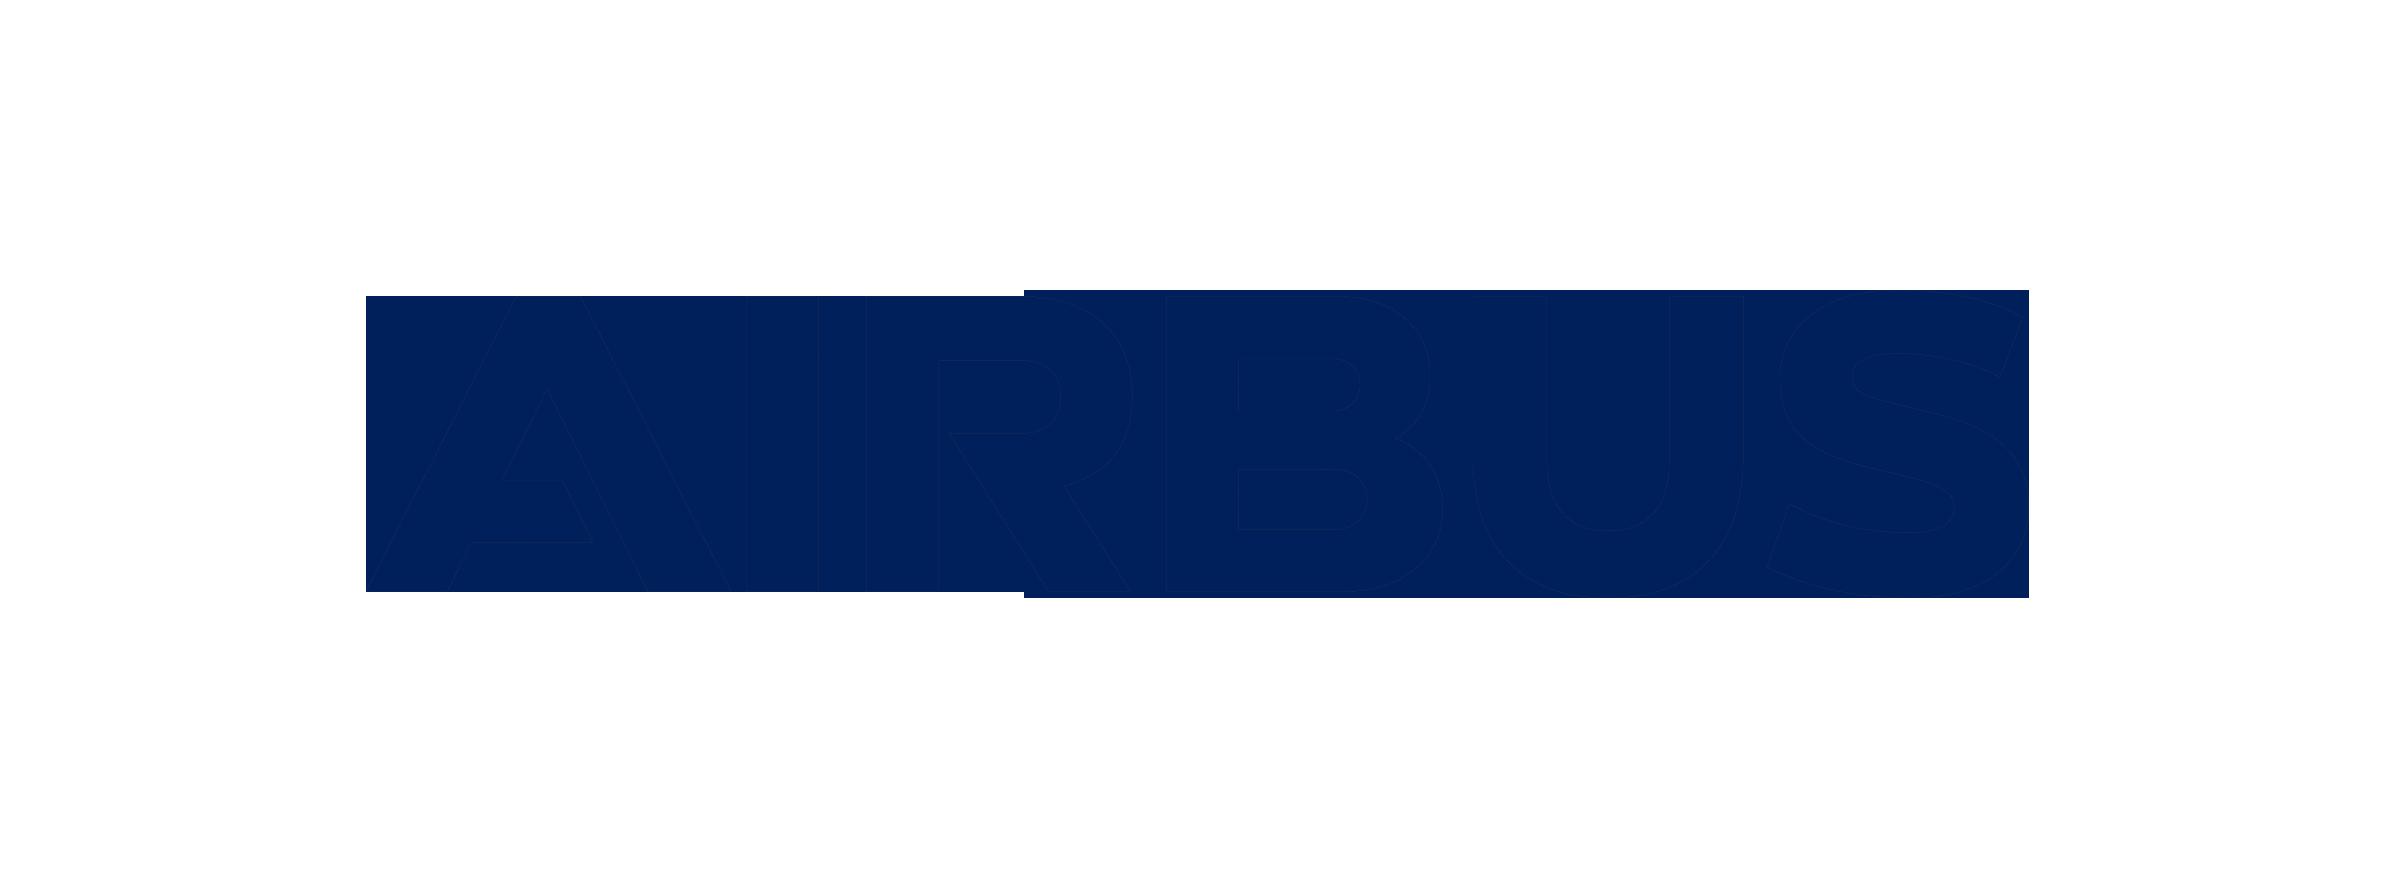 Sponsors_pklihwy5ze6qm6clc_logo_airbus